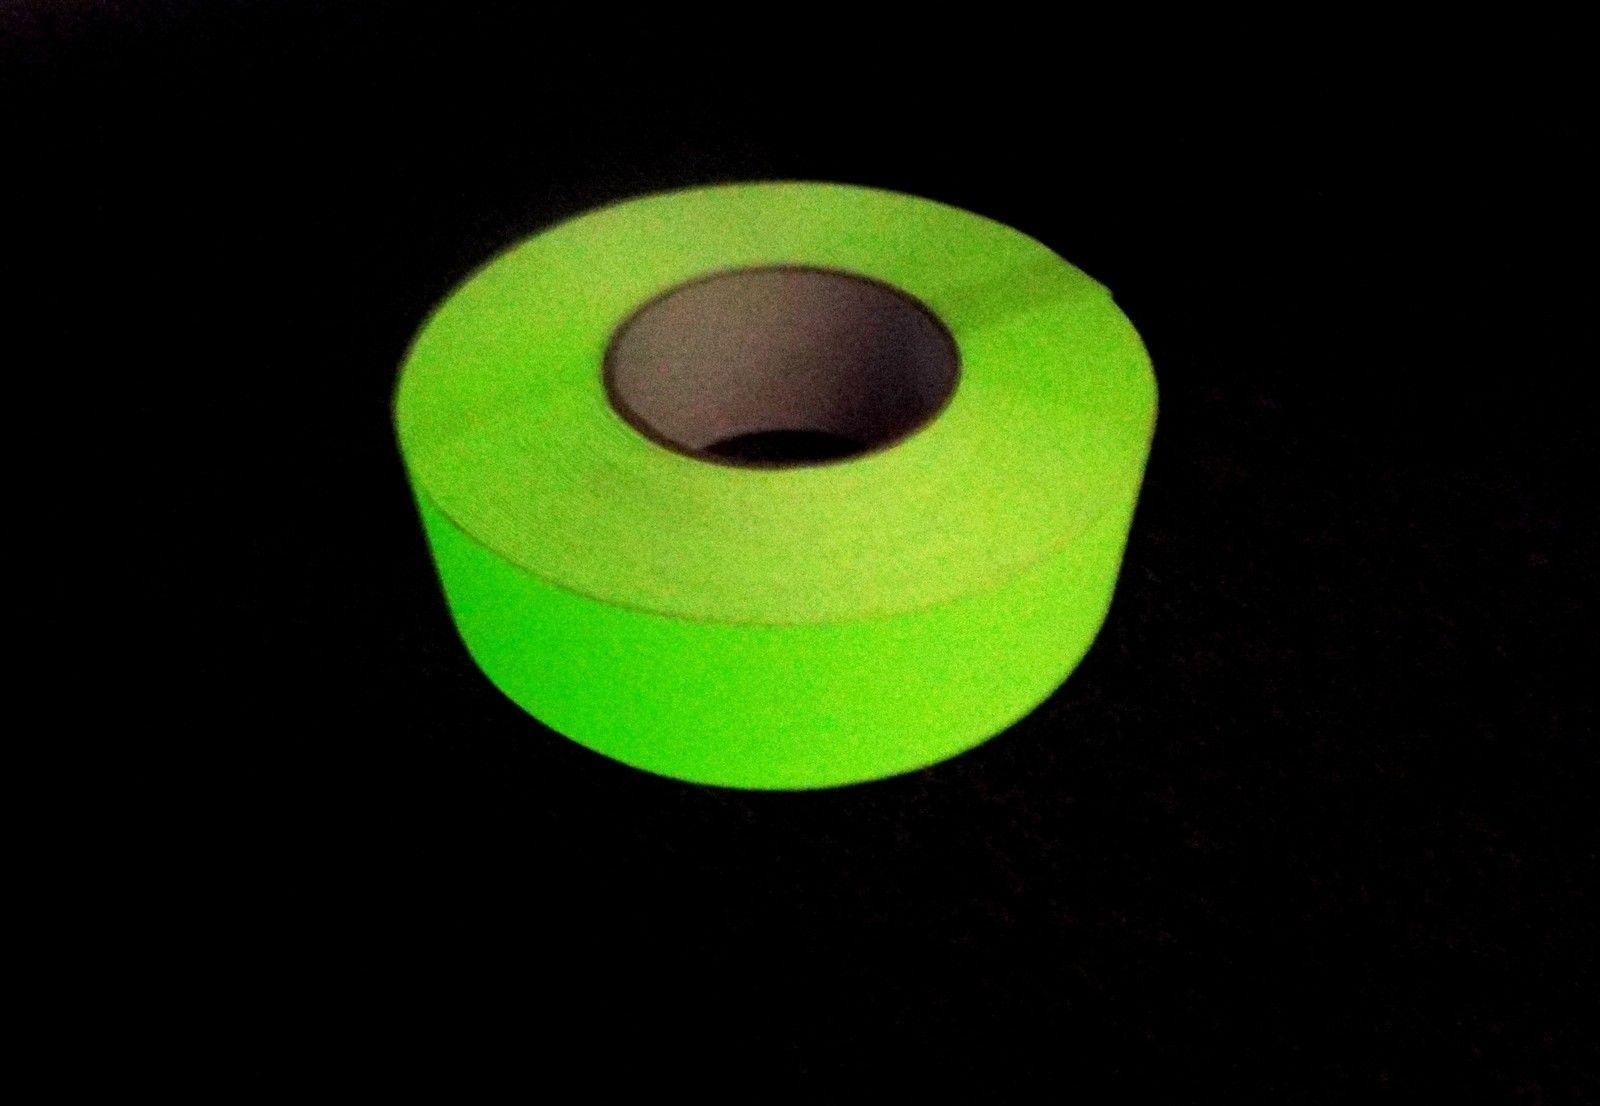 Adhesive Anti-Slip Tape - 50mm wide x 18.3M long - 60 Grit - Photo Luminescent